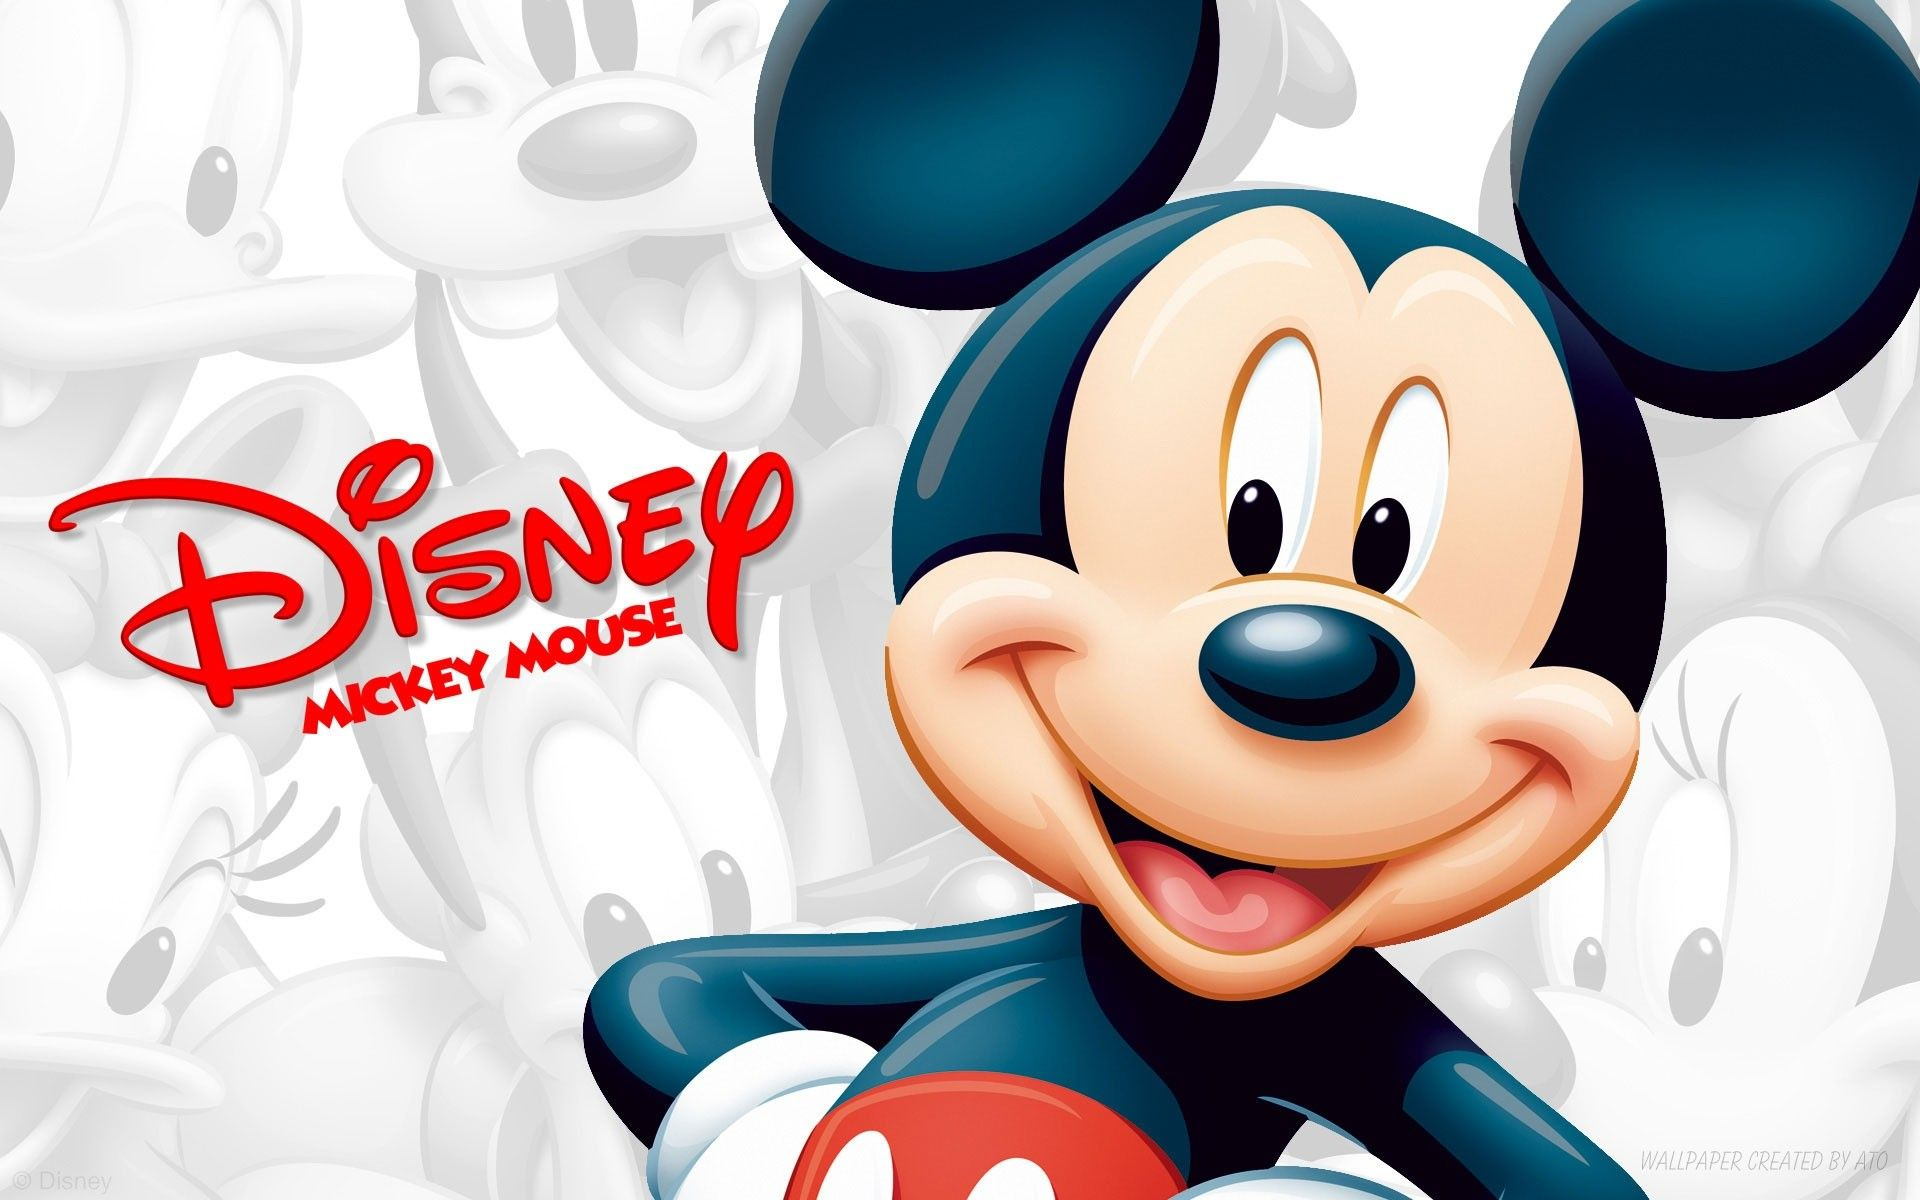 Disney Cartoon Iphone Wallpapers Top Free Disney Cartoon